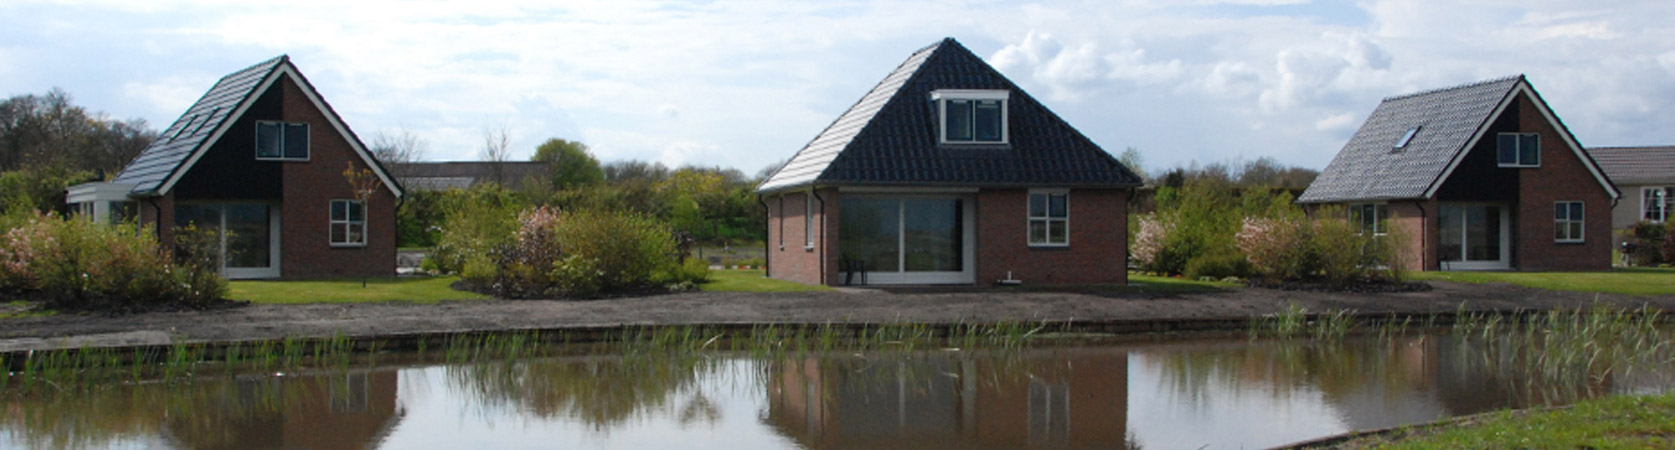 Landgoed De Huynen